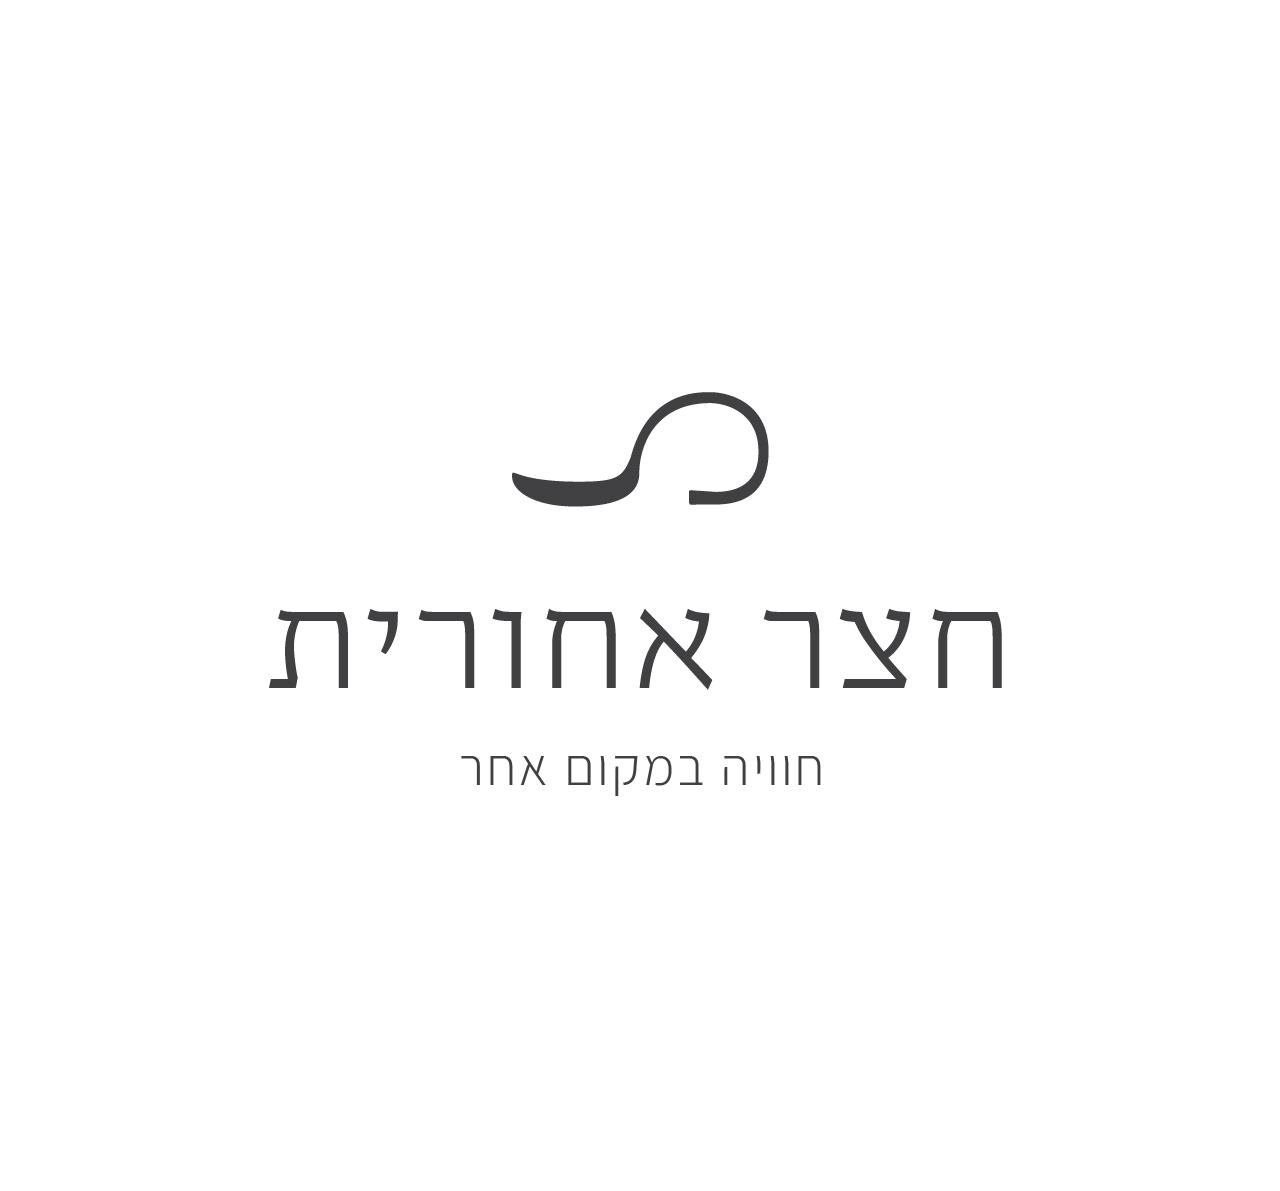 logo-Hatser Ahorit